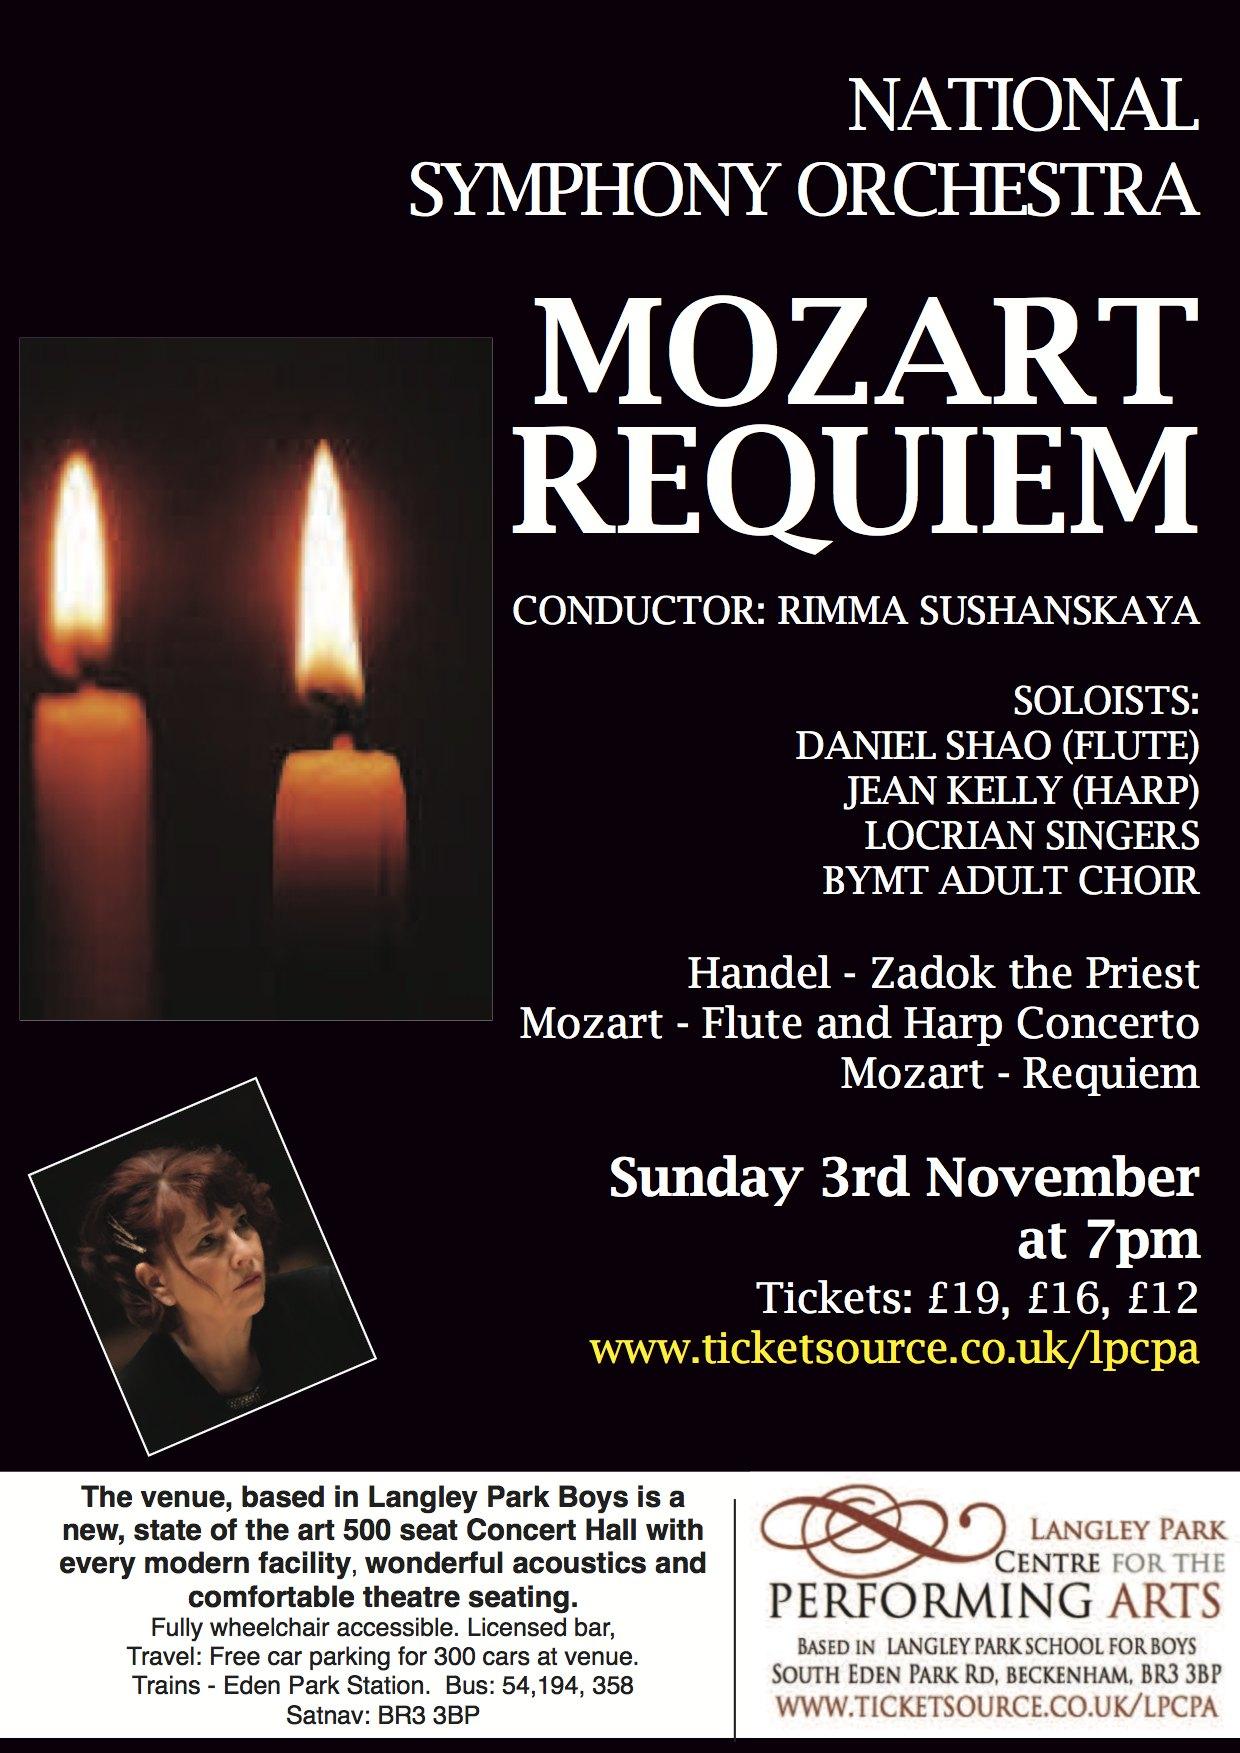 National Symphony Orchestra - Mozart Requiem banner image